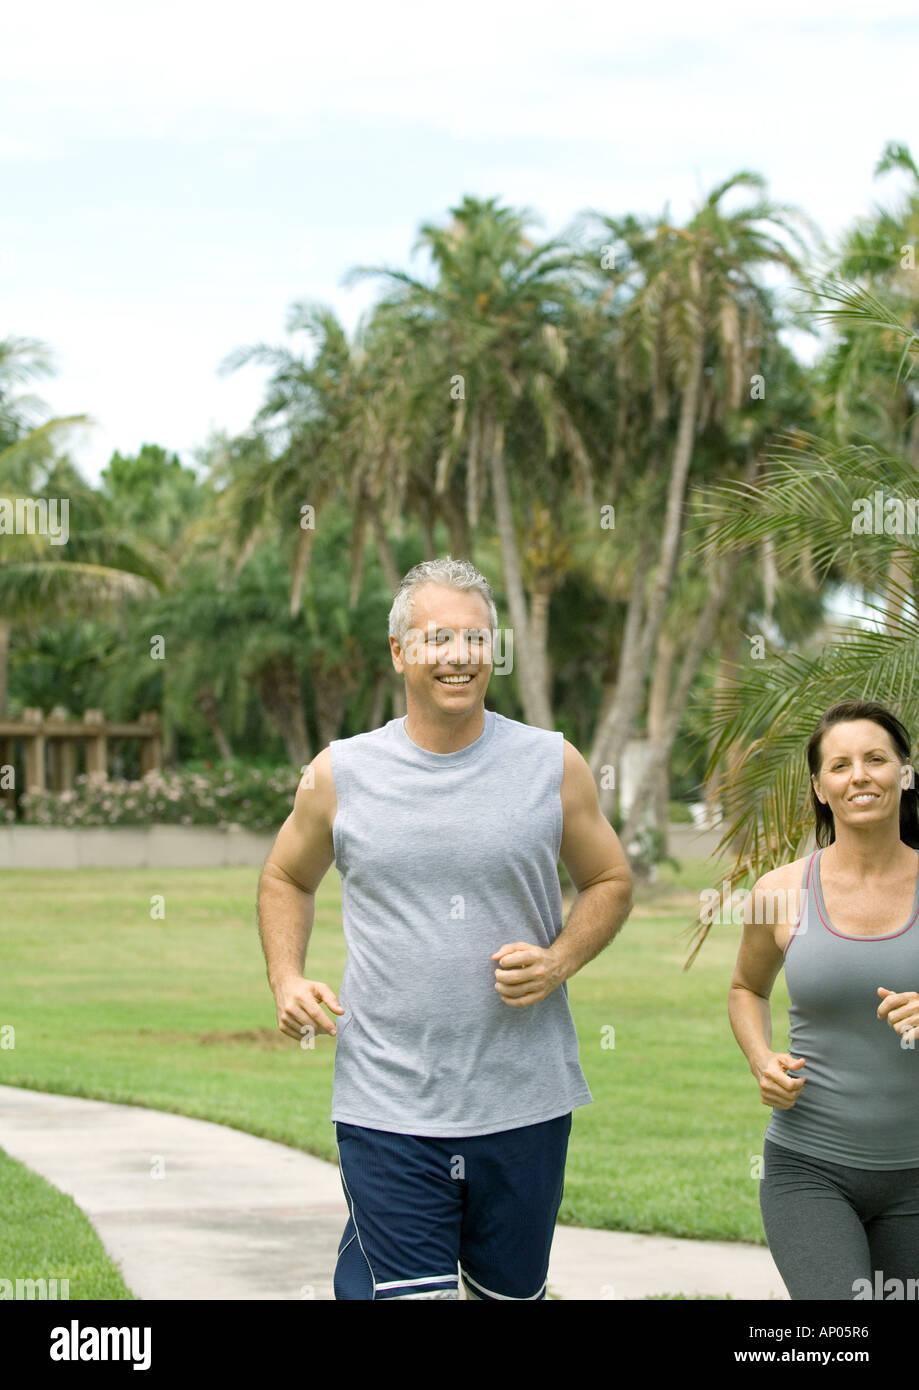 Mature couple running on walkway - Stock Image